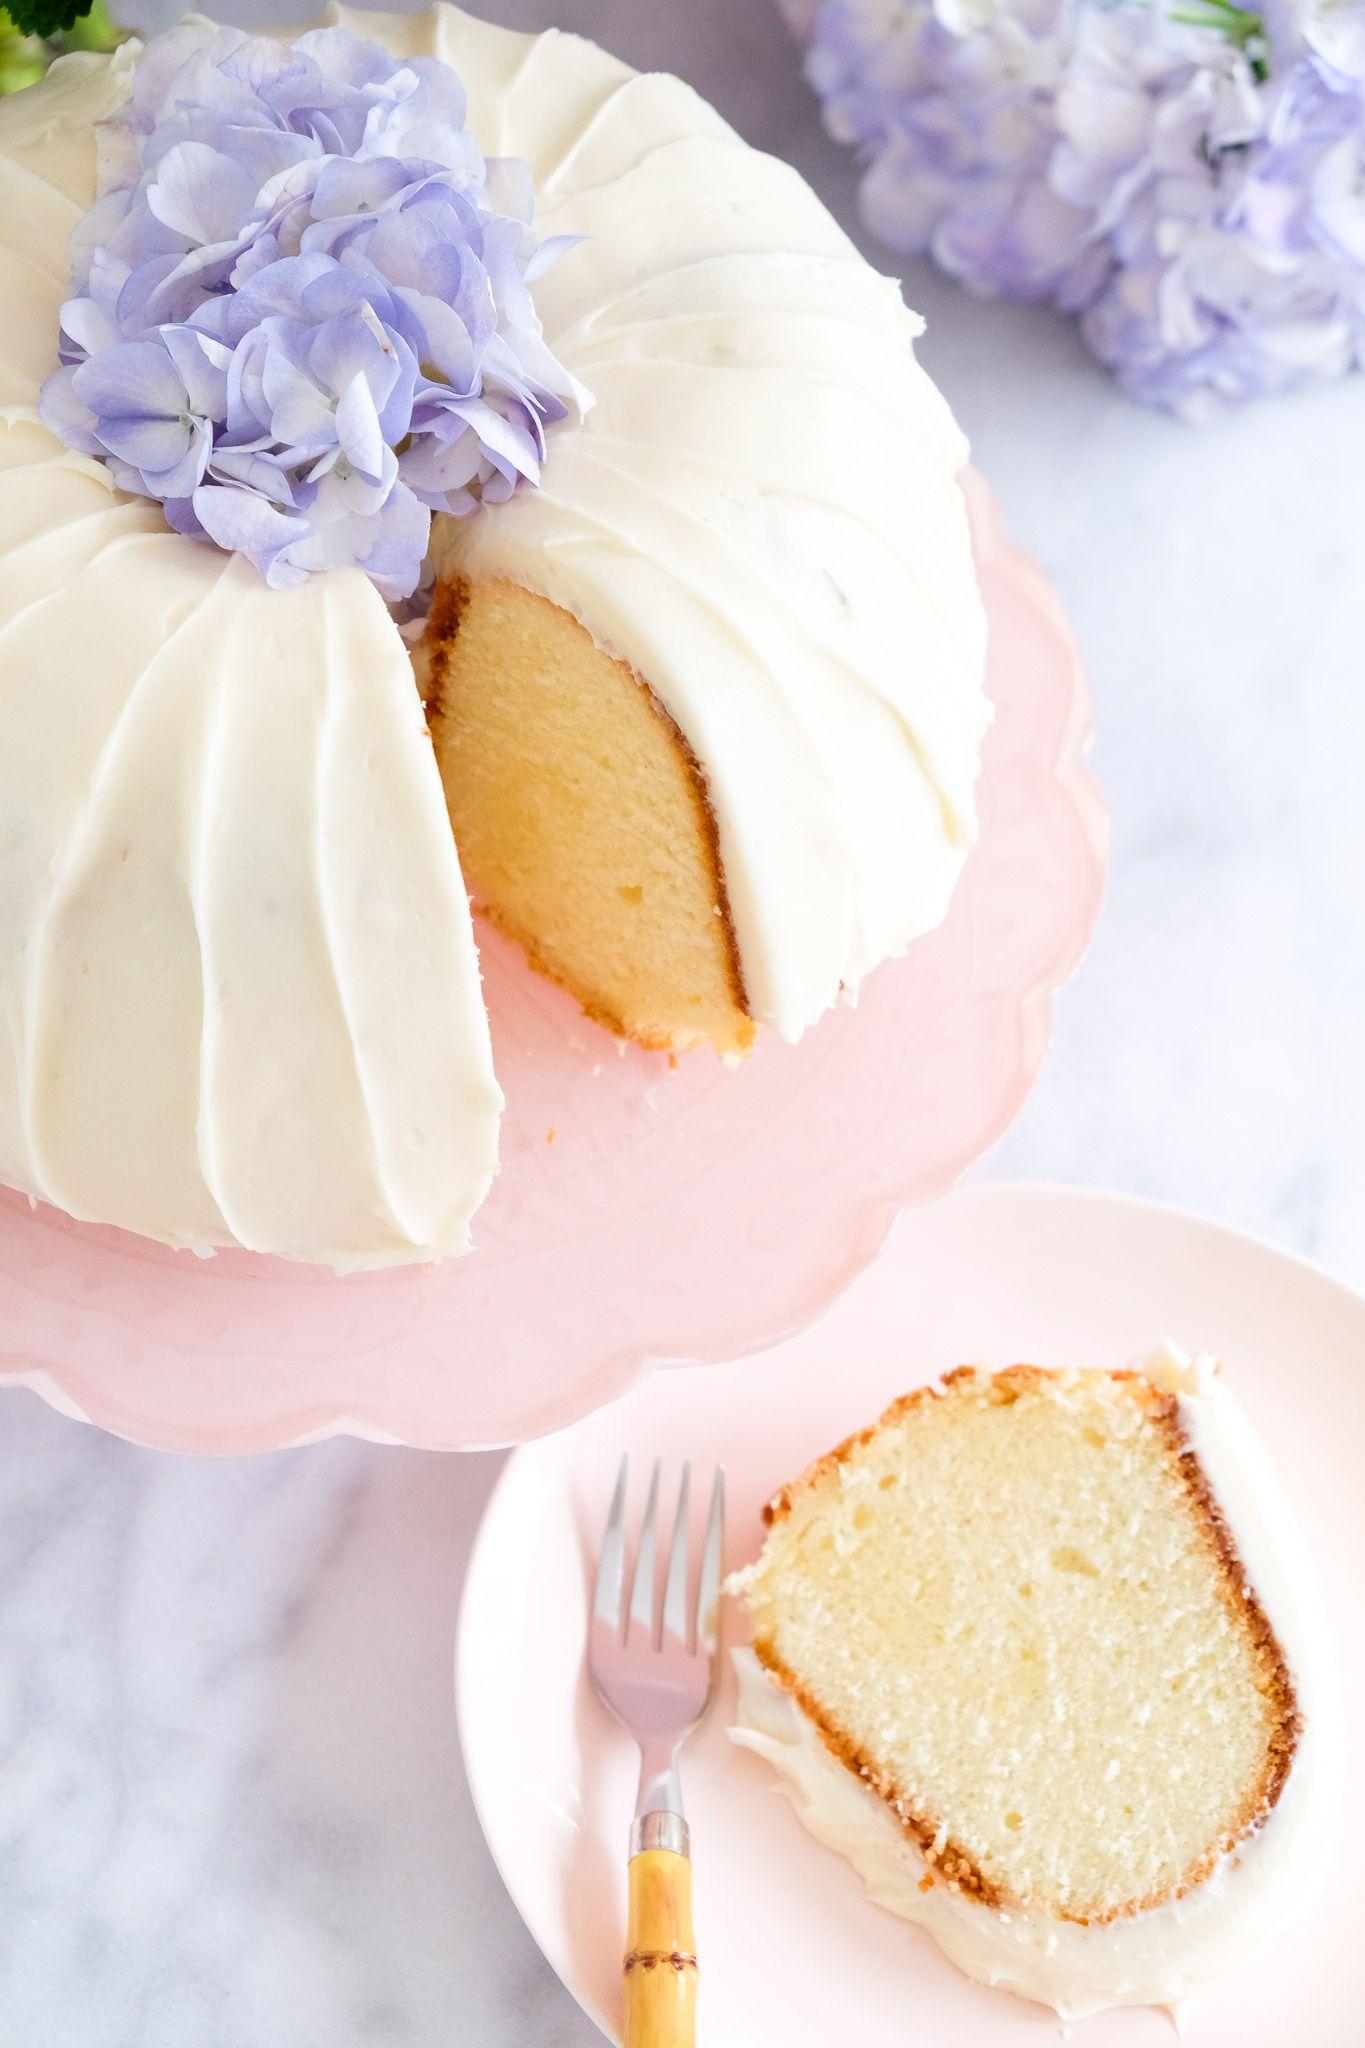 Sour Cream Pound Cake W Cream Cheese Icing Petite Southern Kitchen In 2020 Sour Cream Pound Cake Pound Cake Icing Sour Cream